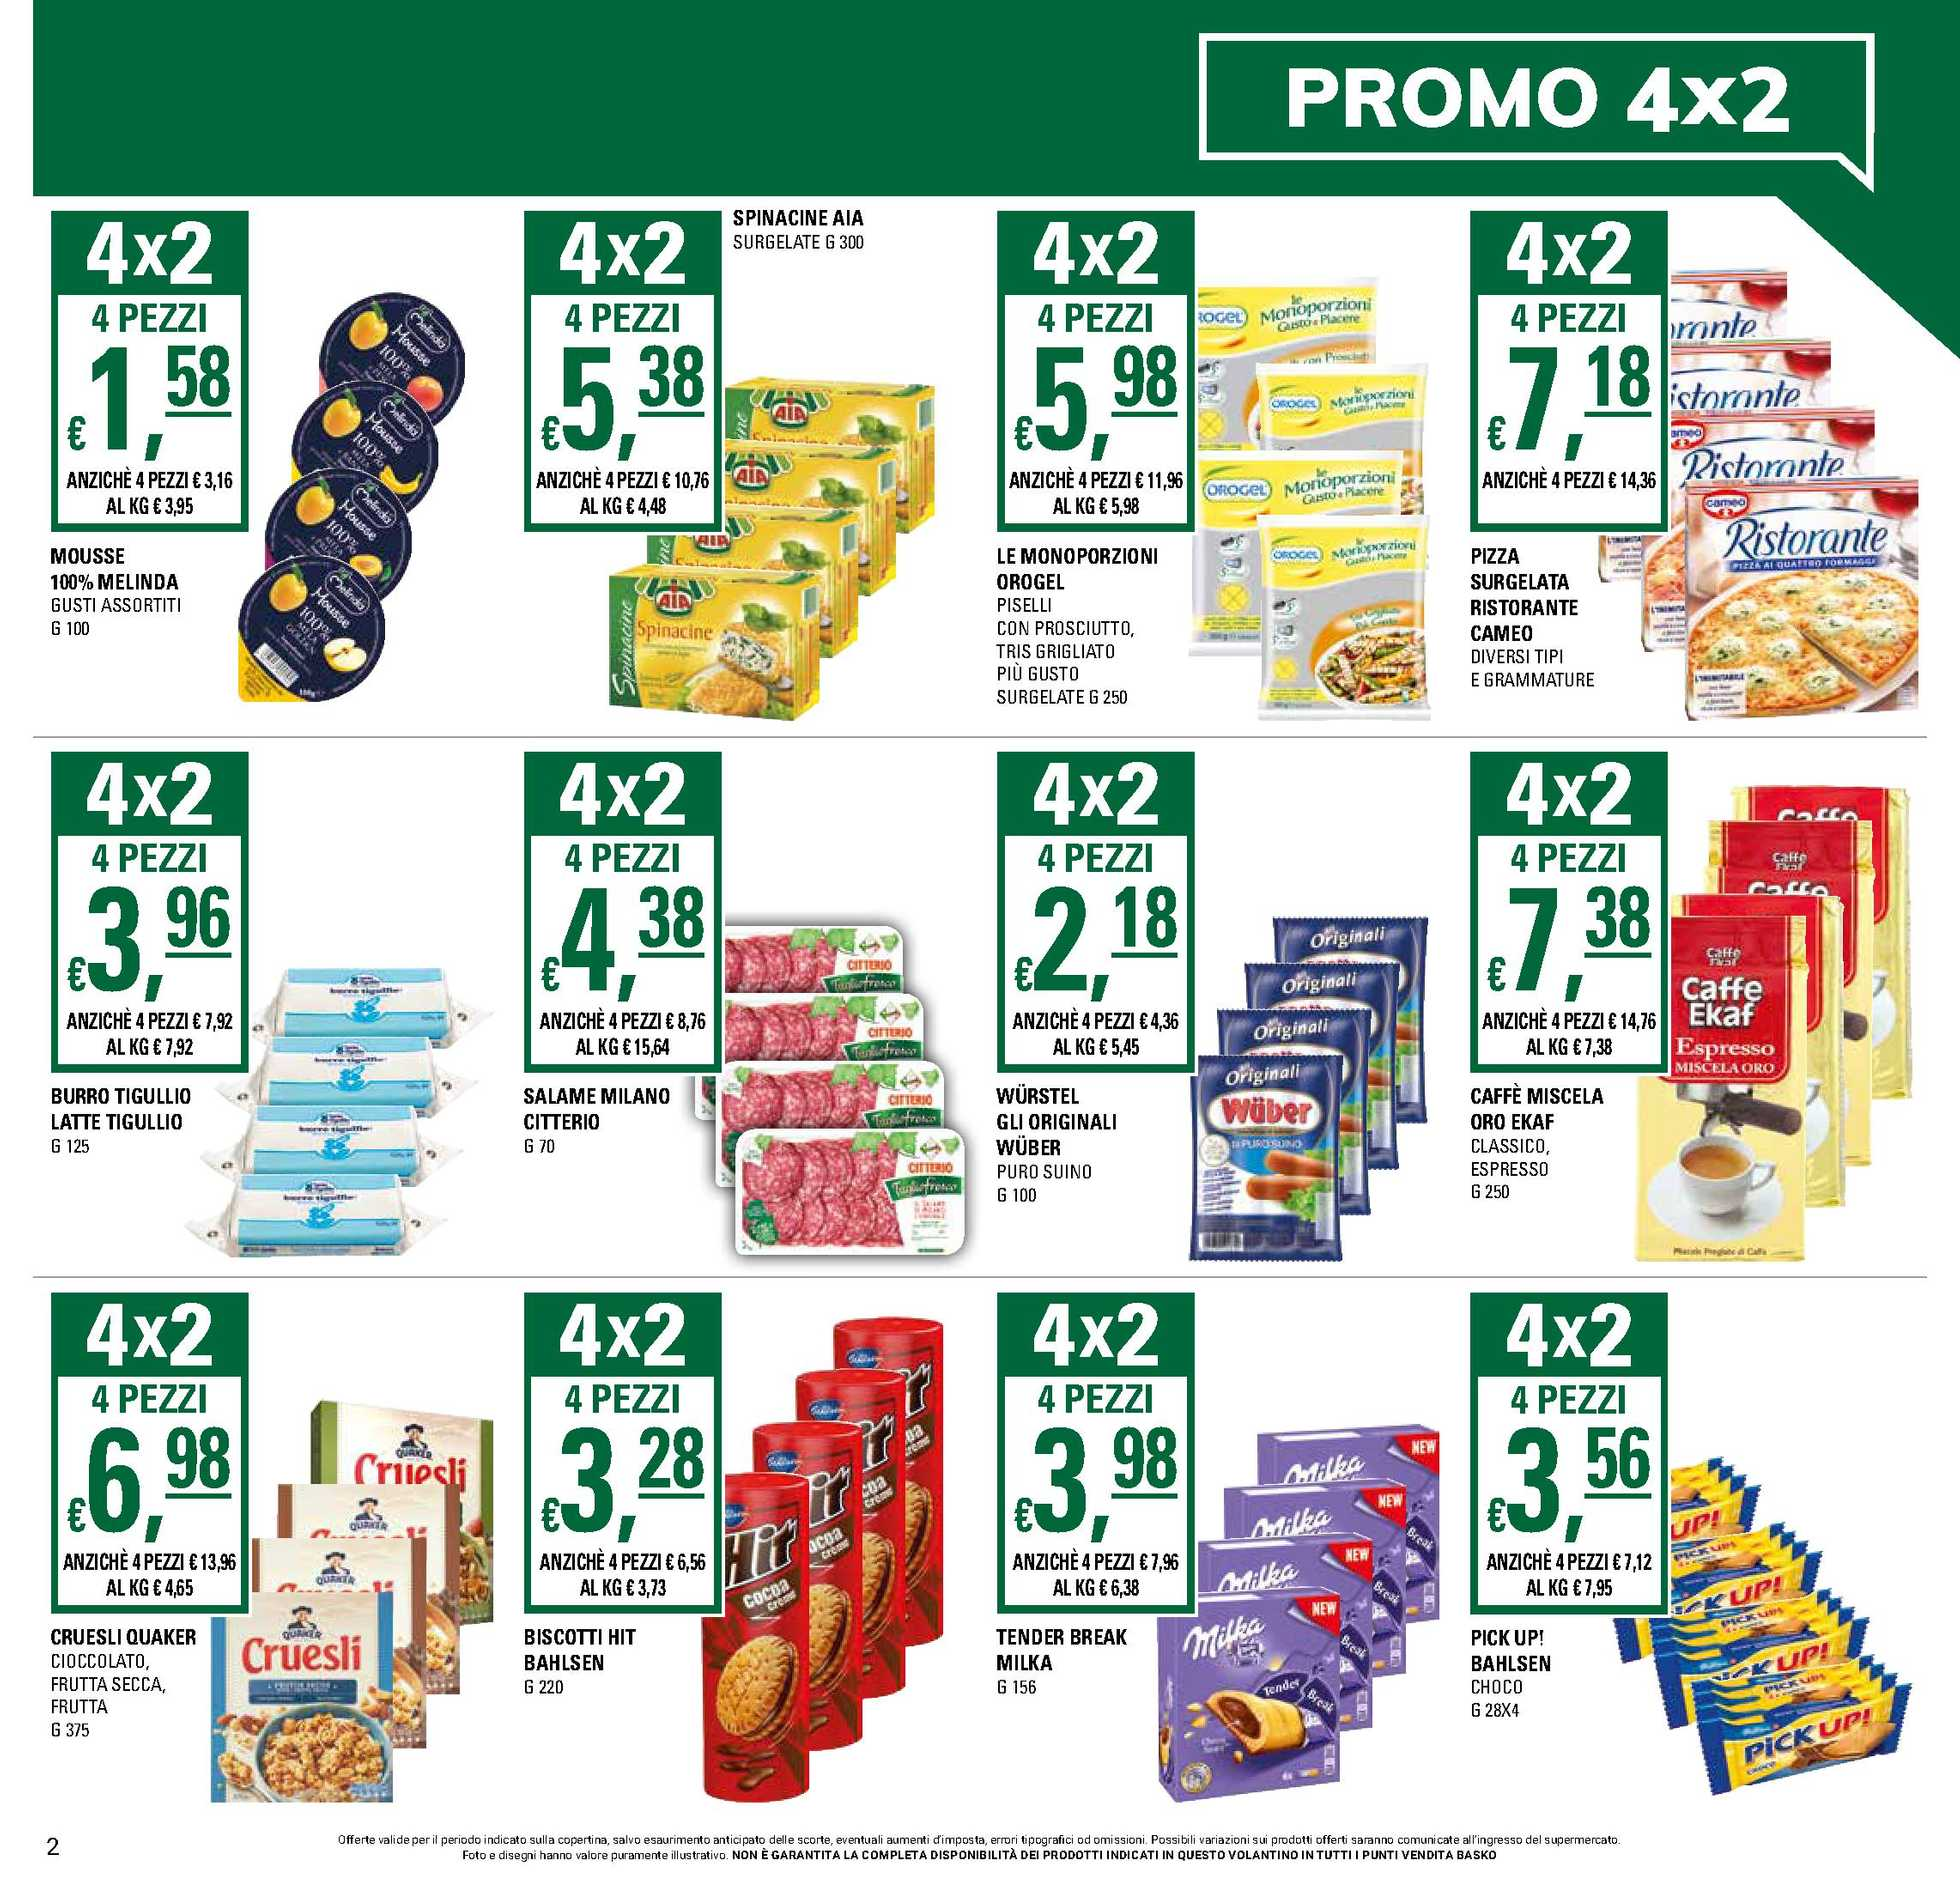 Basko - offerte valide dal 24.11.2020 al 02.12.2020 - pagina 2.